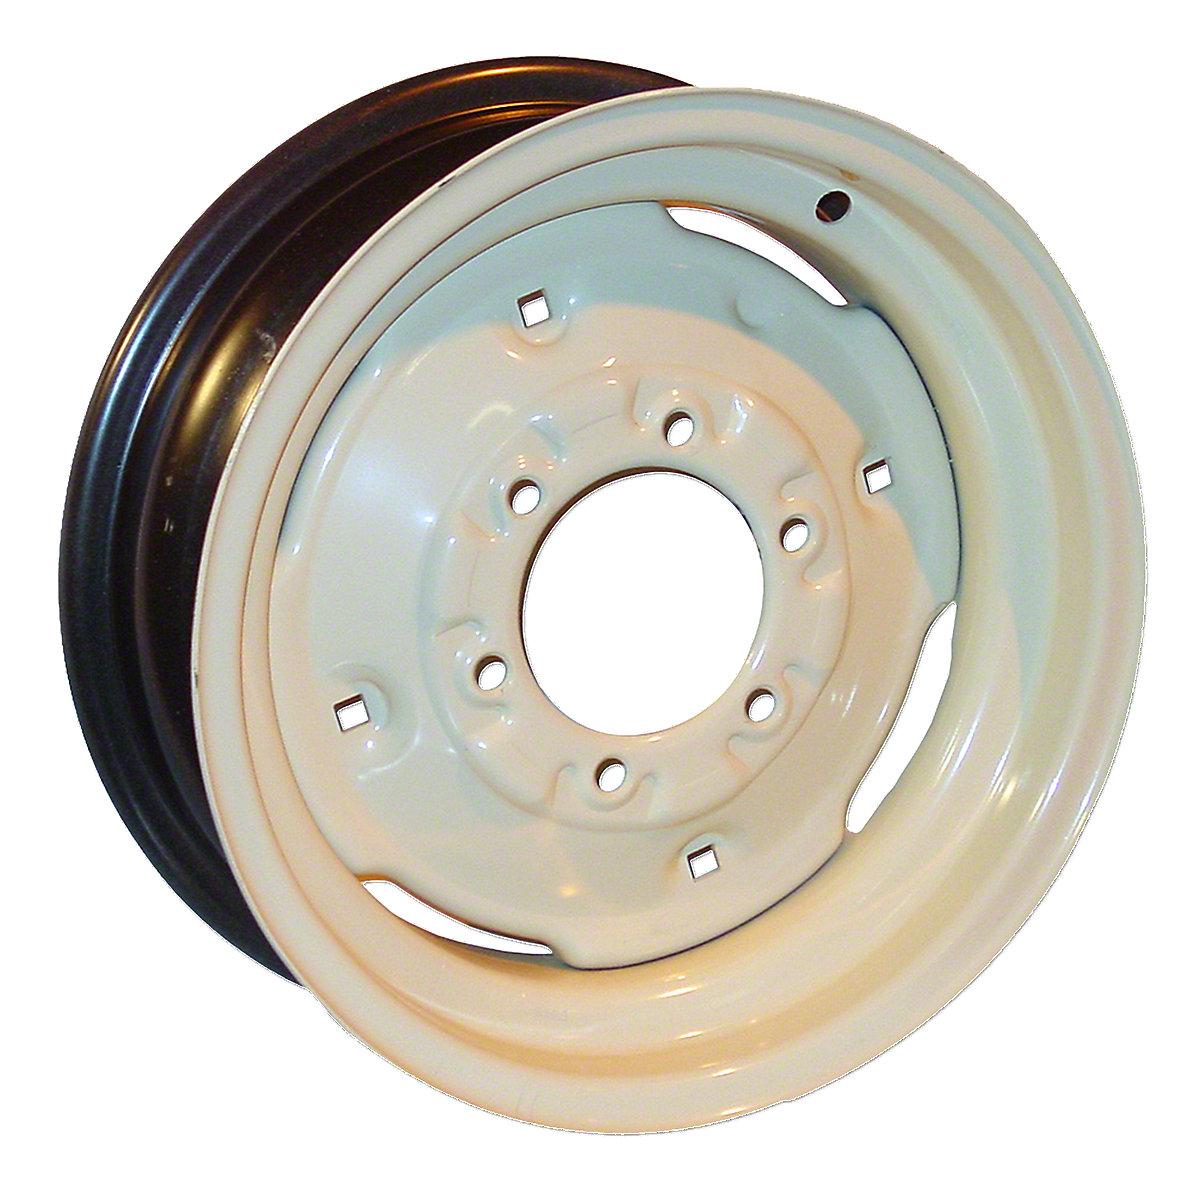 6X16 6 Lug Front Wheel For Allis Chalmers: 190XT, 160, 170, 175, 180, 185, 190, 200, 6060, 6070, 6080, 7000, D19, I60, I600, D17.